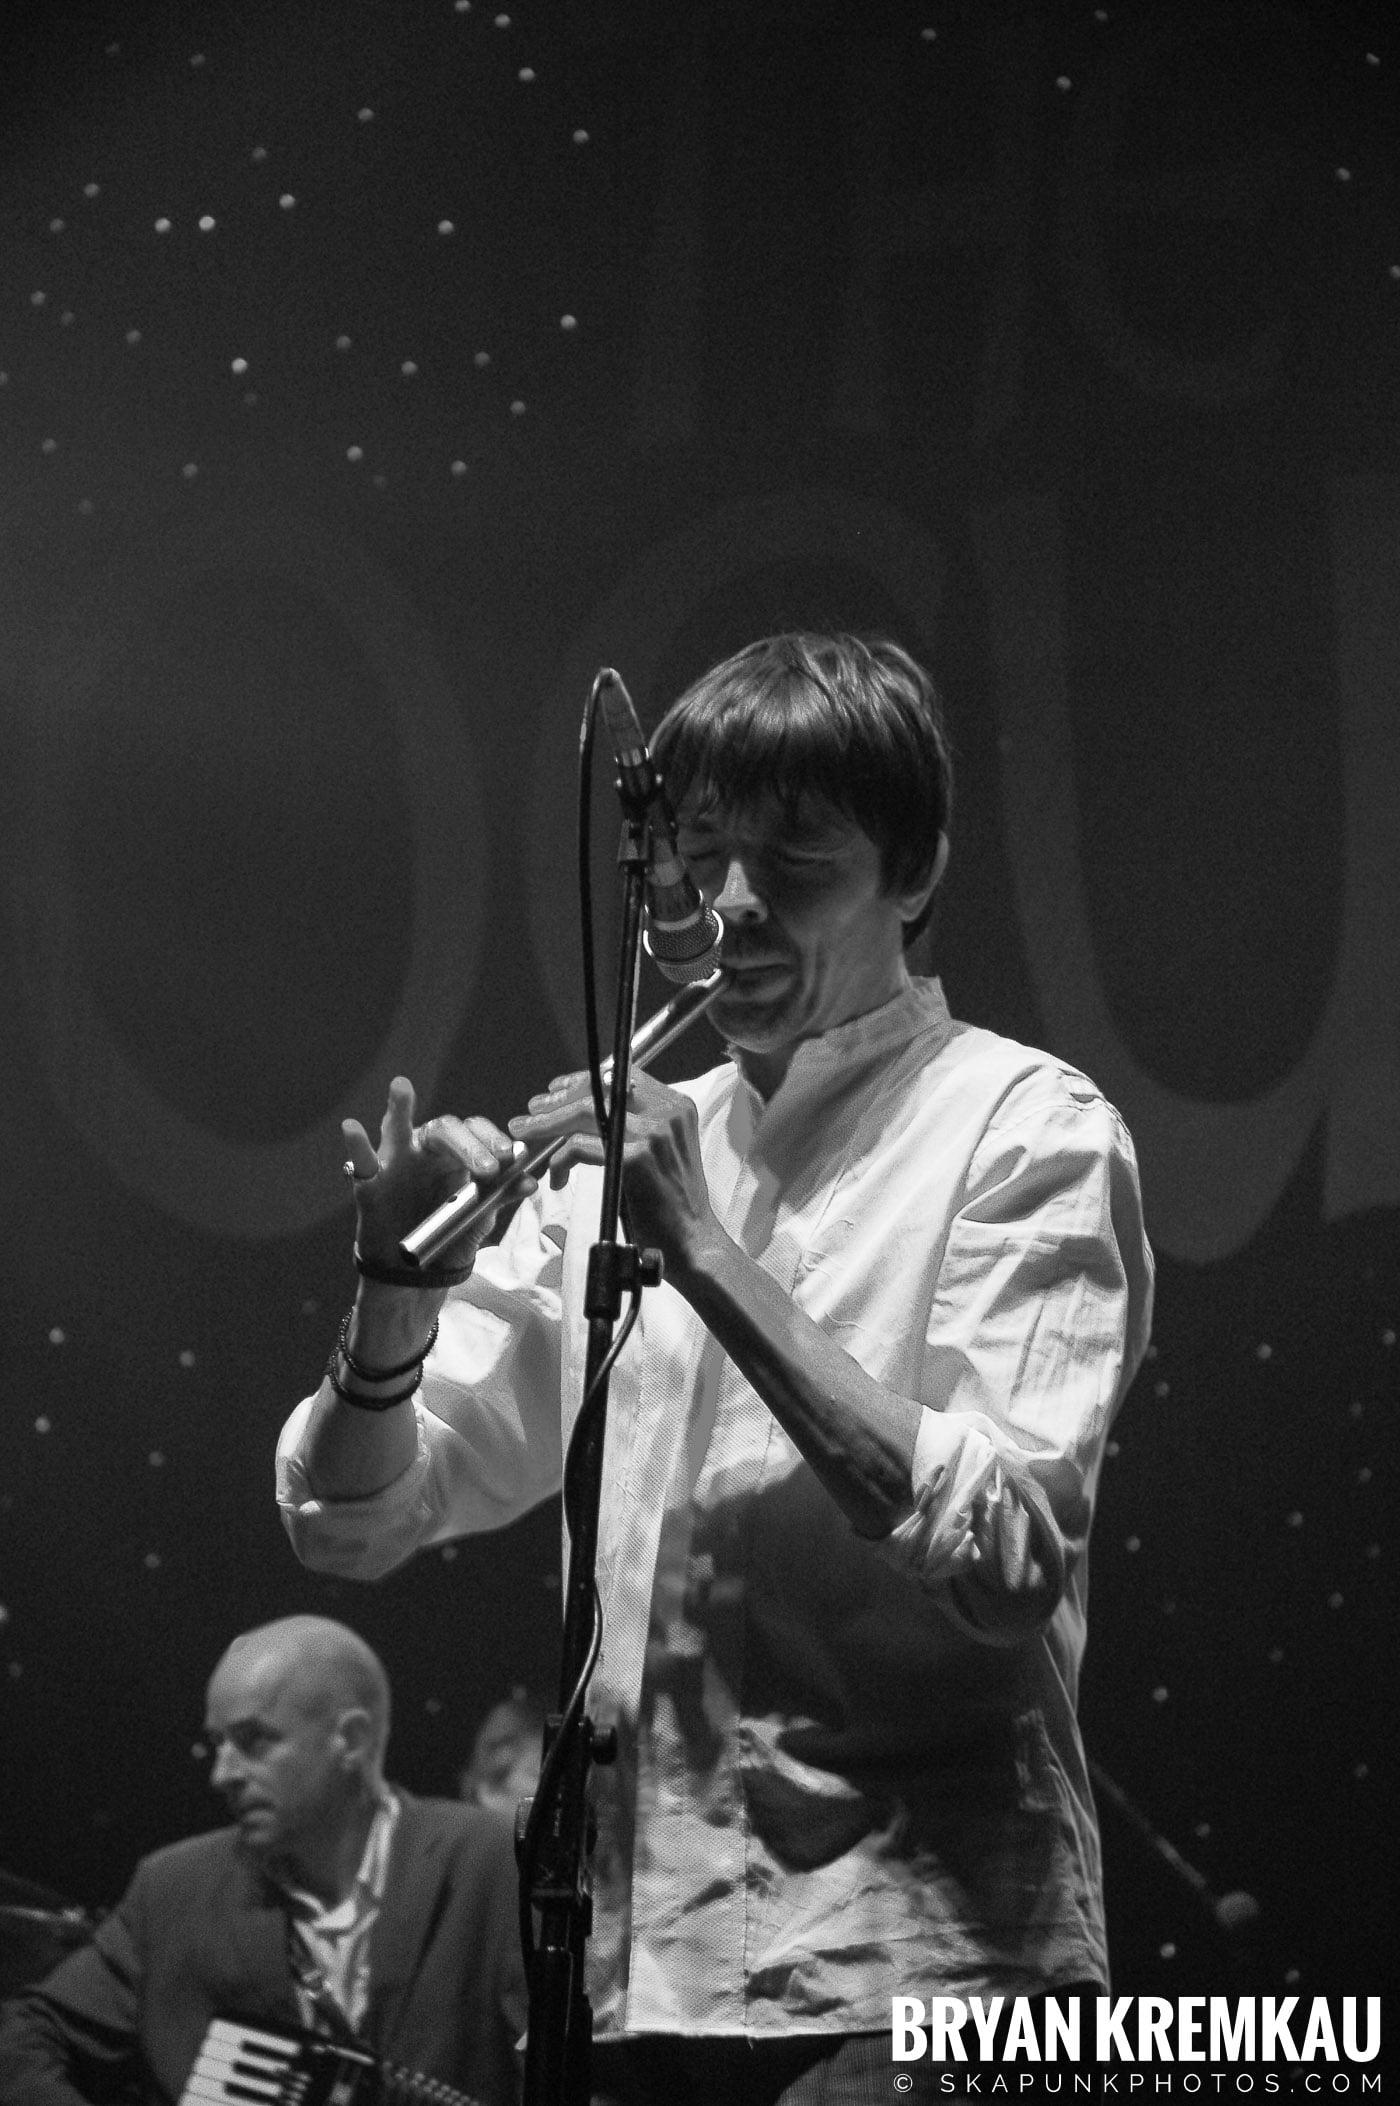 The Pogues @ Brixton Academy, London UK - 12.19.05 (7)